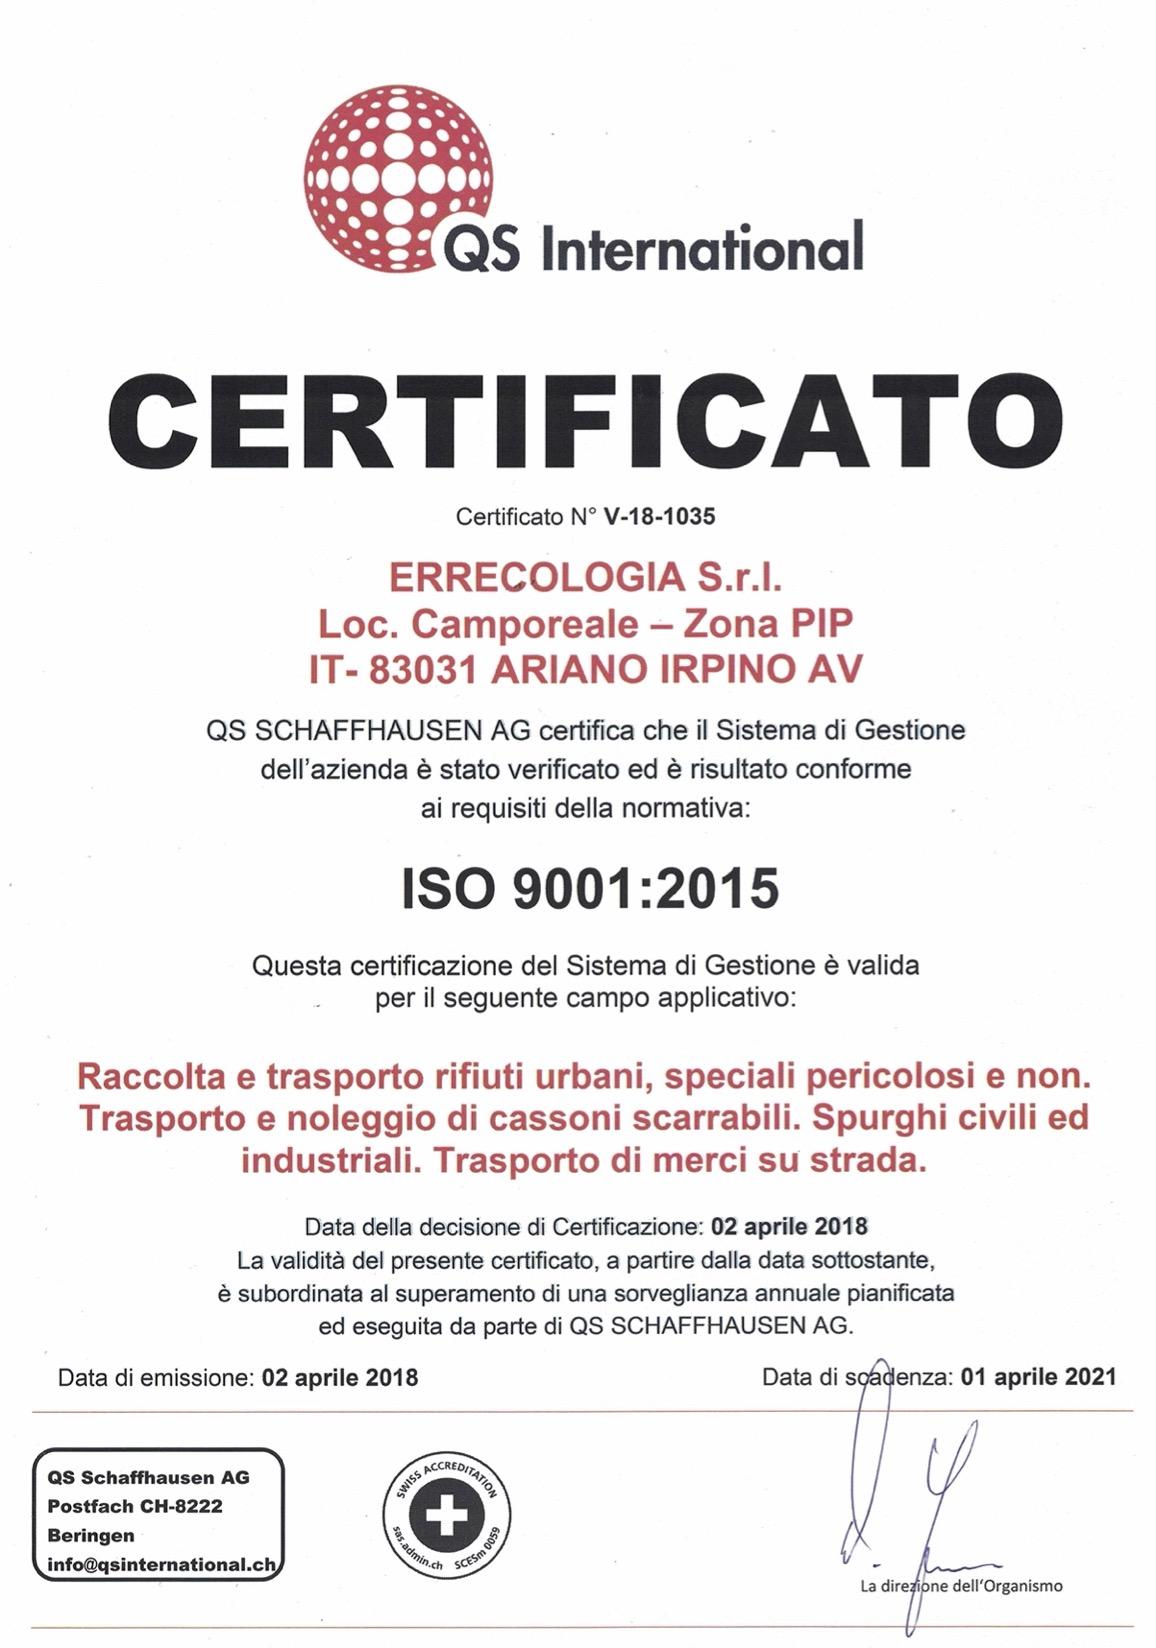 ISO 9001:2015 - Errecologia